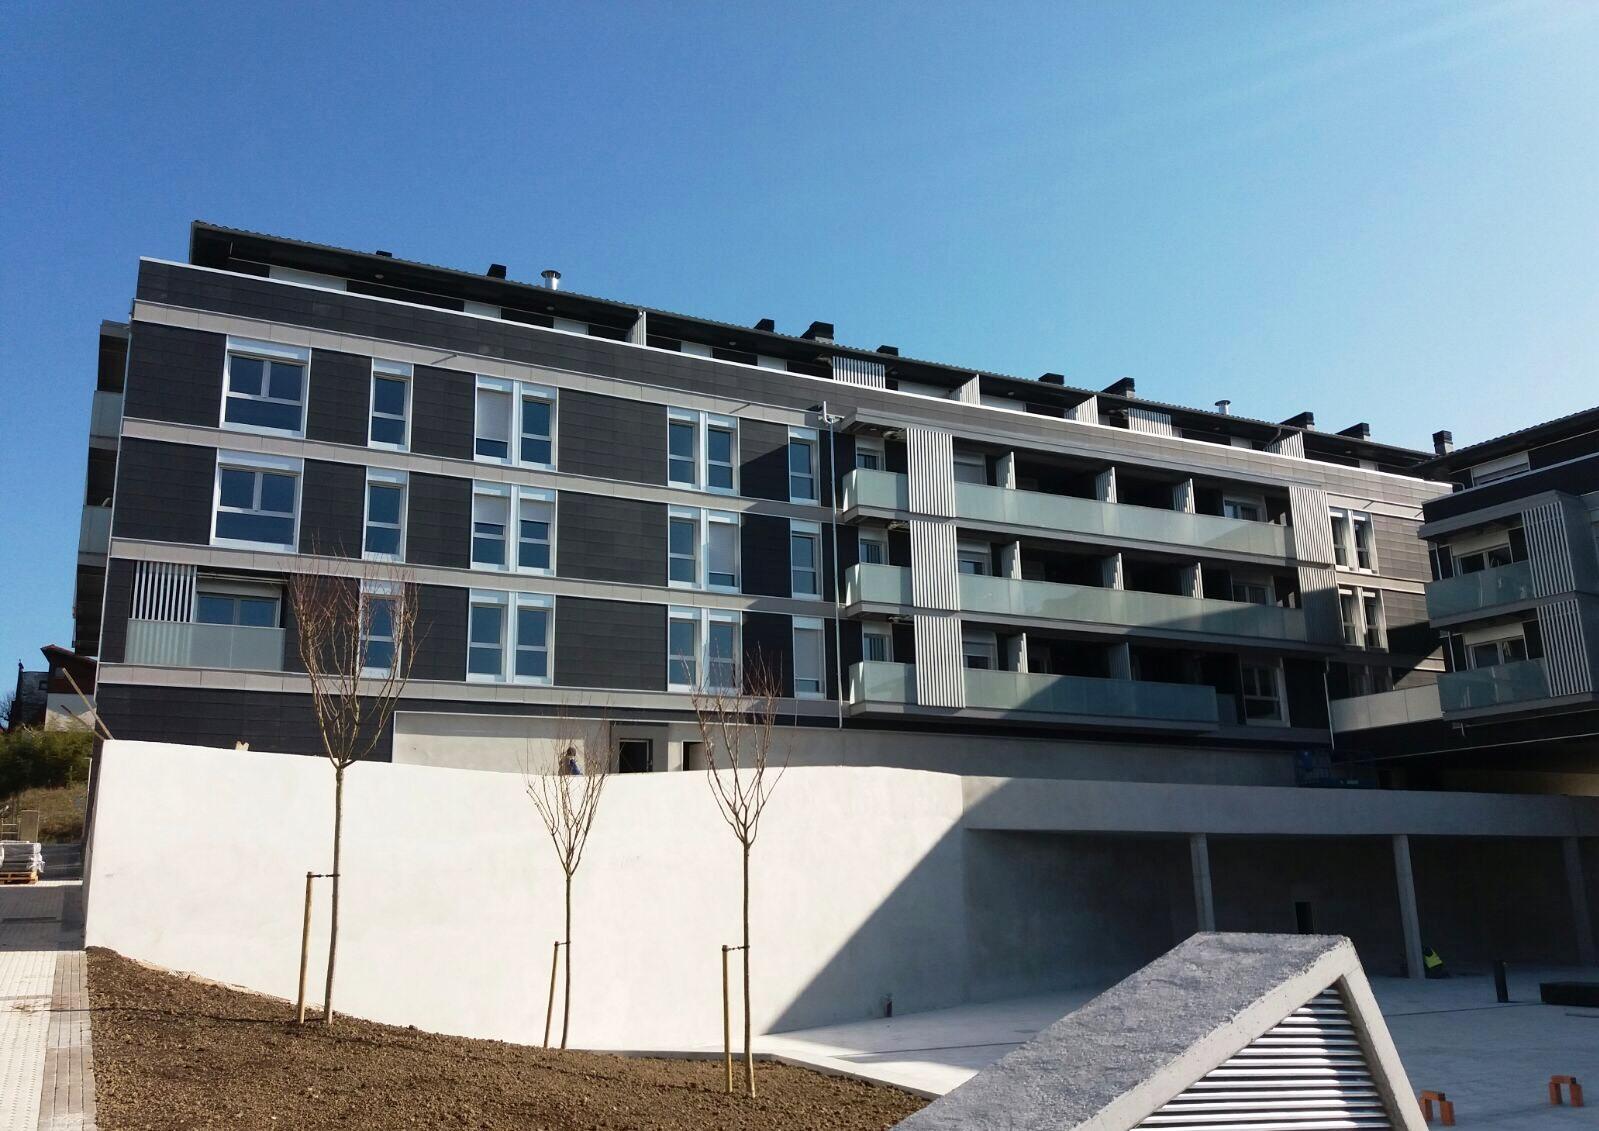 65 viviendas en Hondarribia